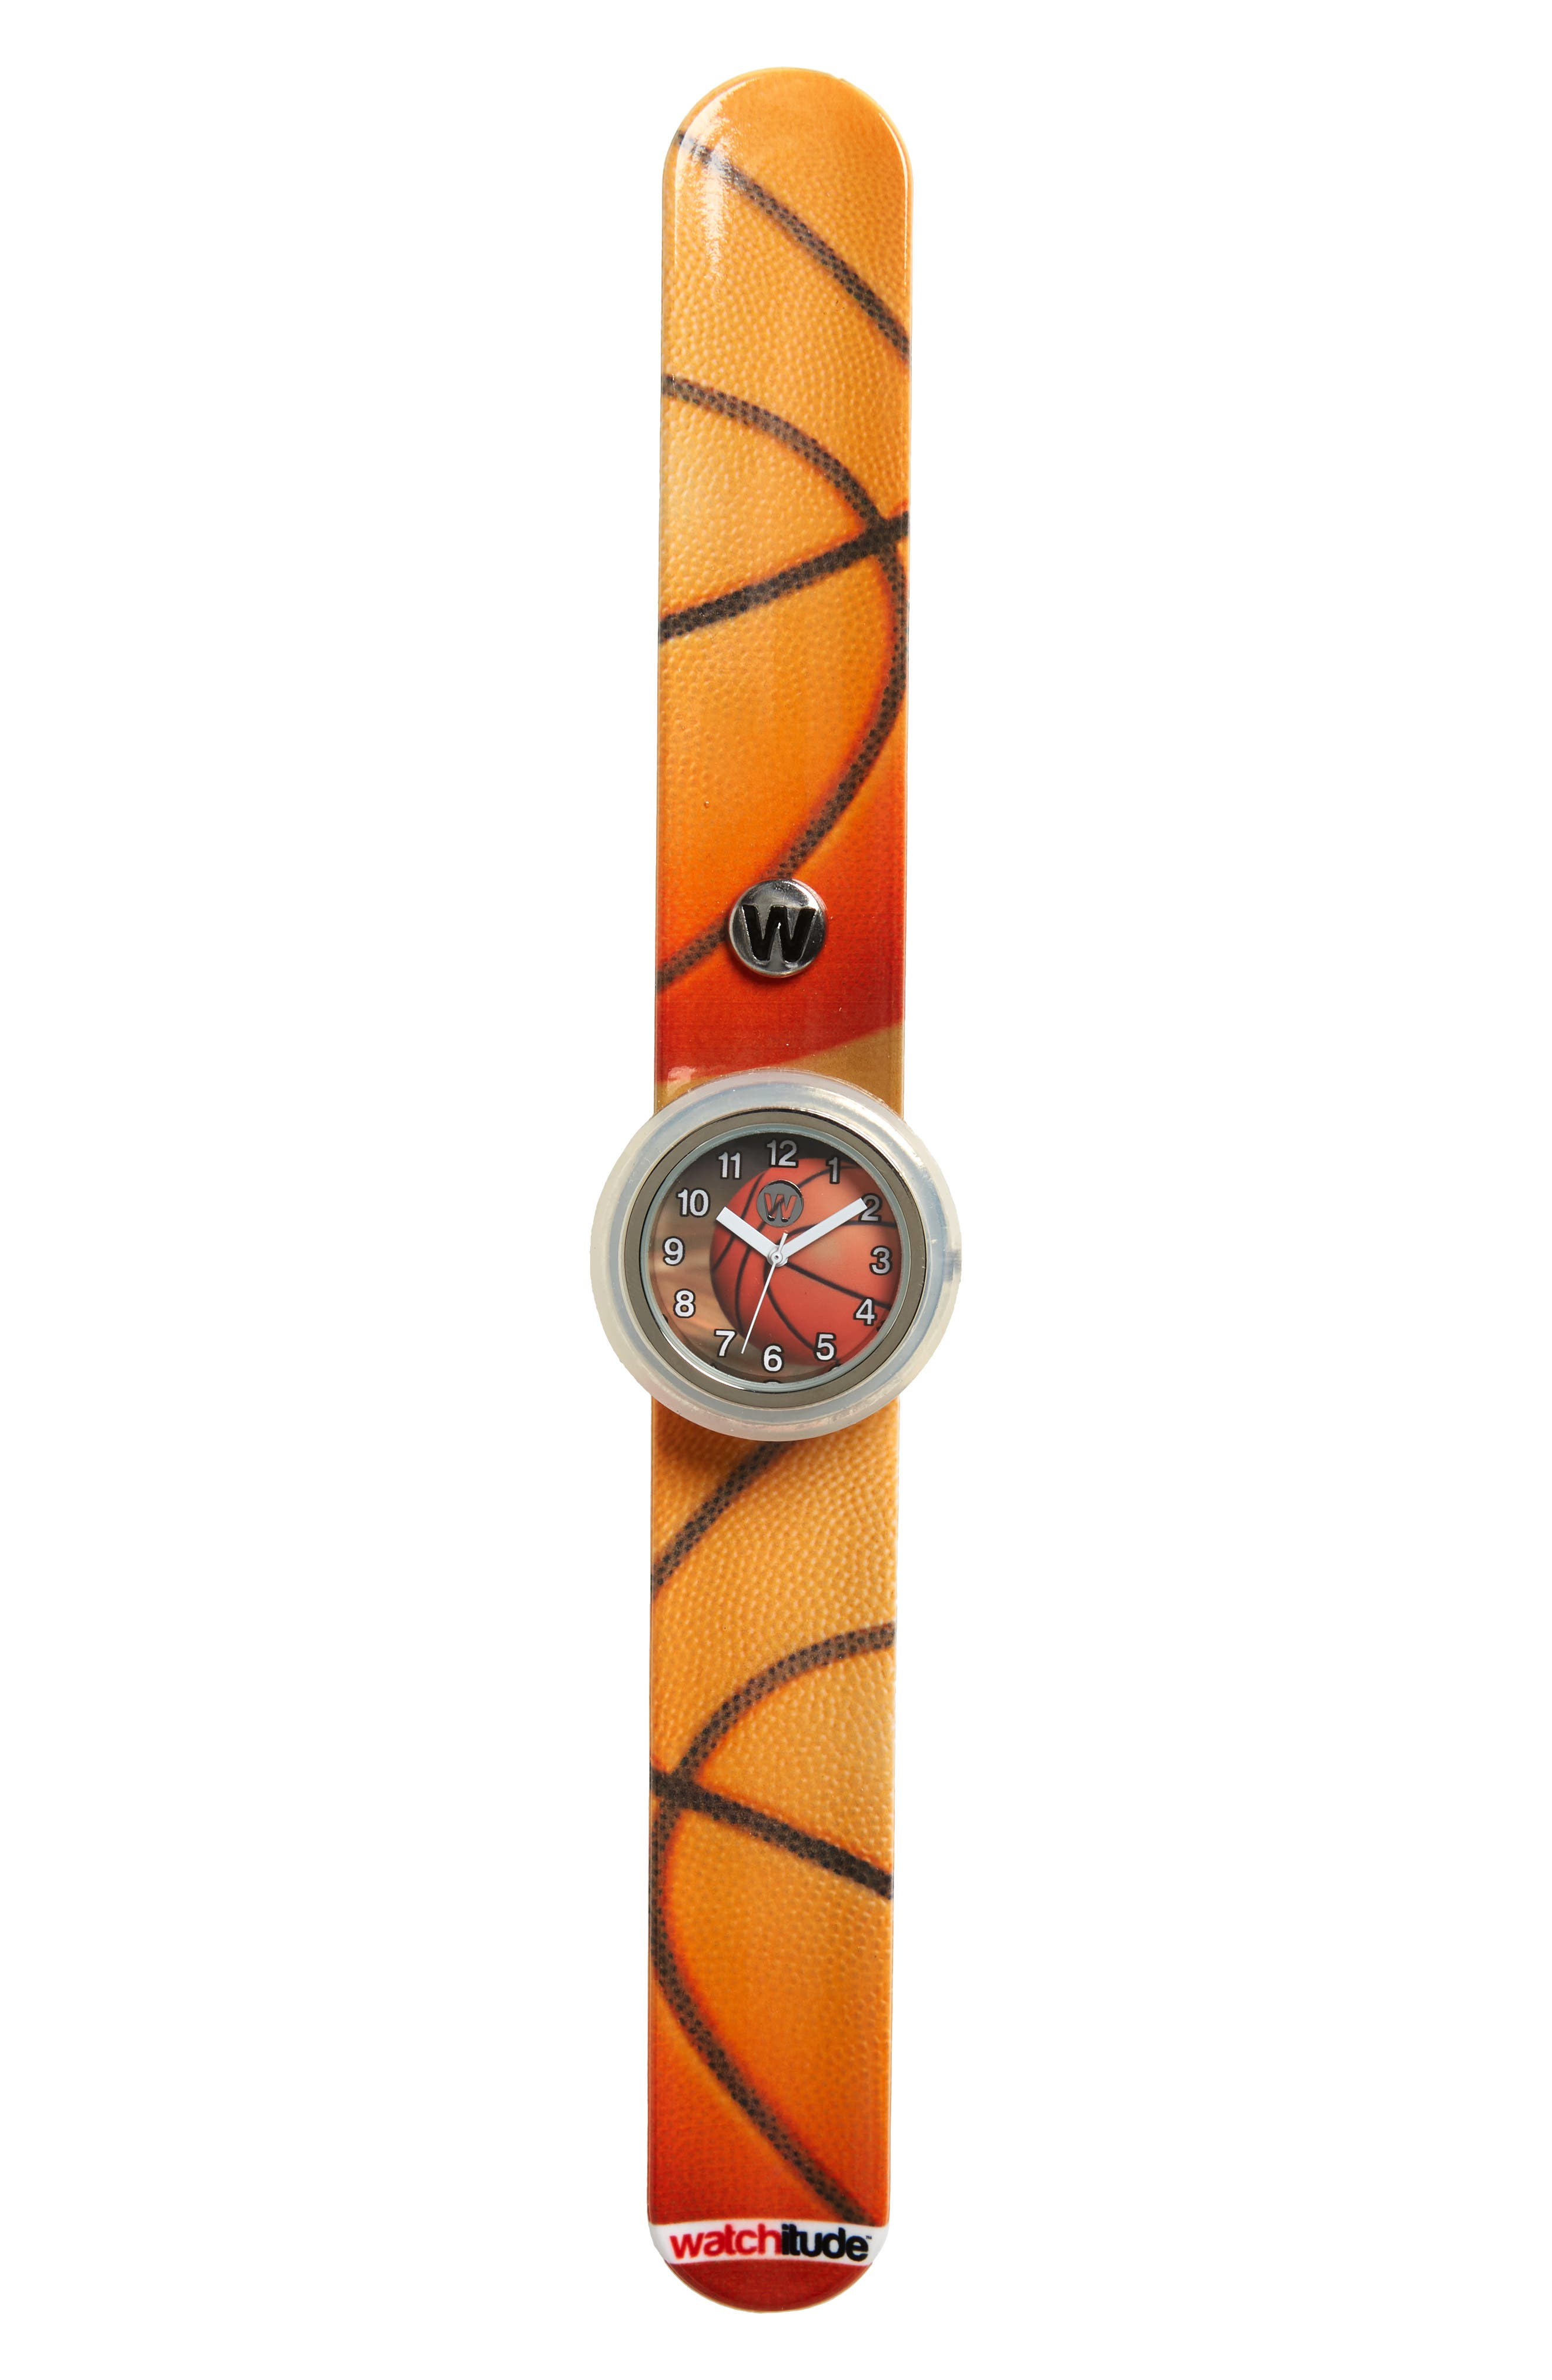 Basketball Slap Watch,                             Main thumbnail 1, color,                             ORANGE